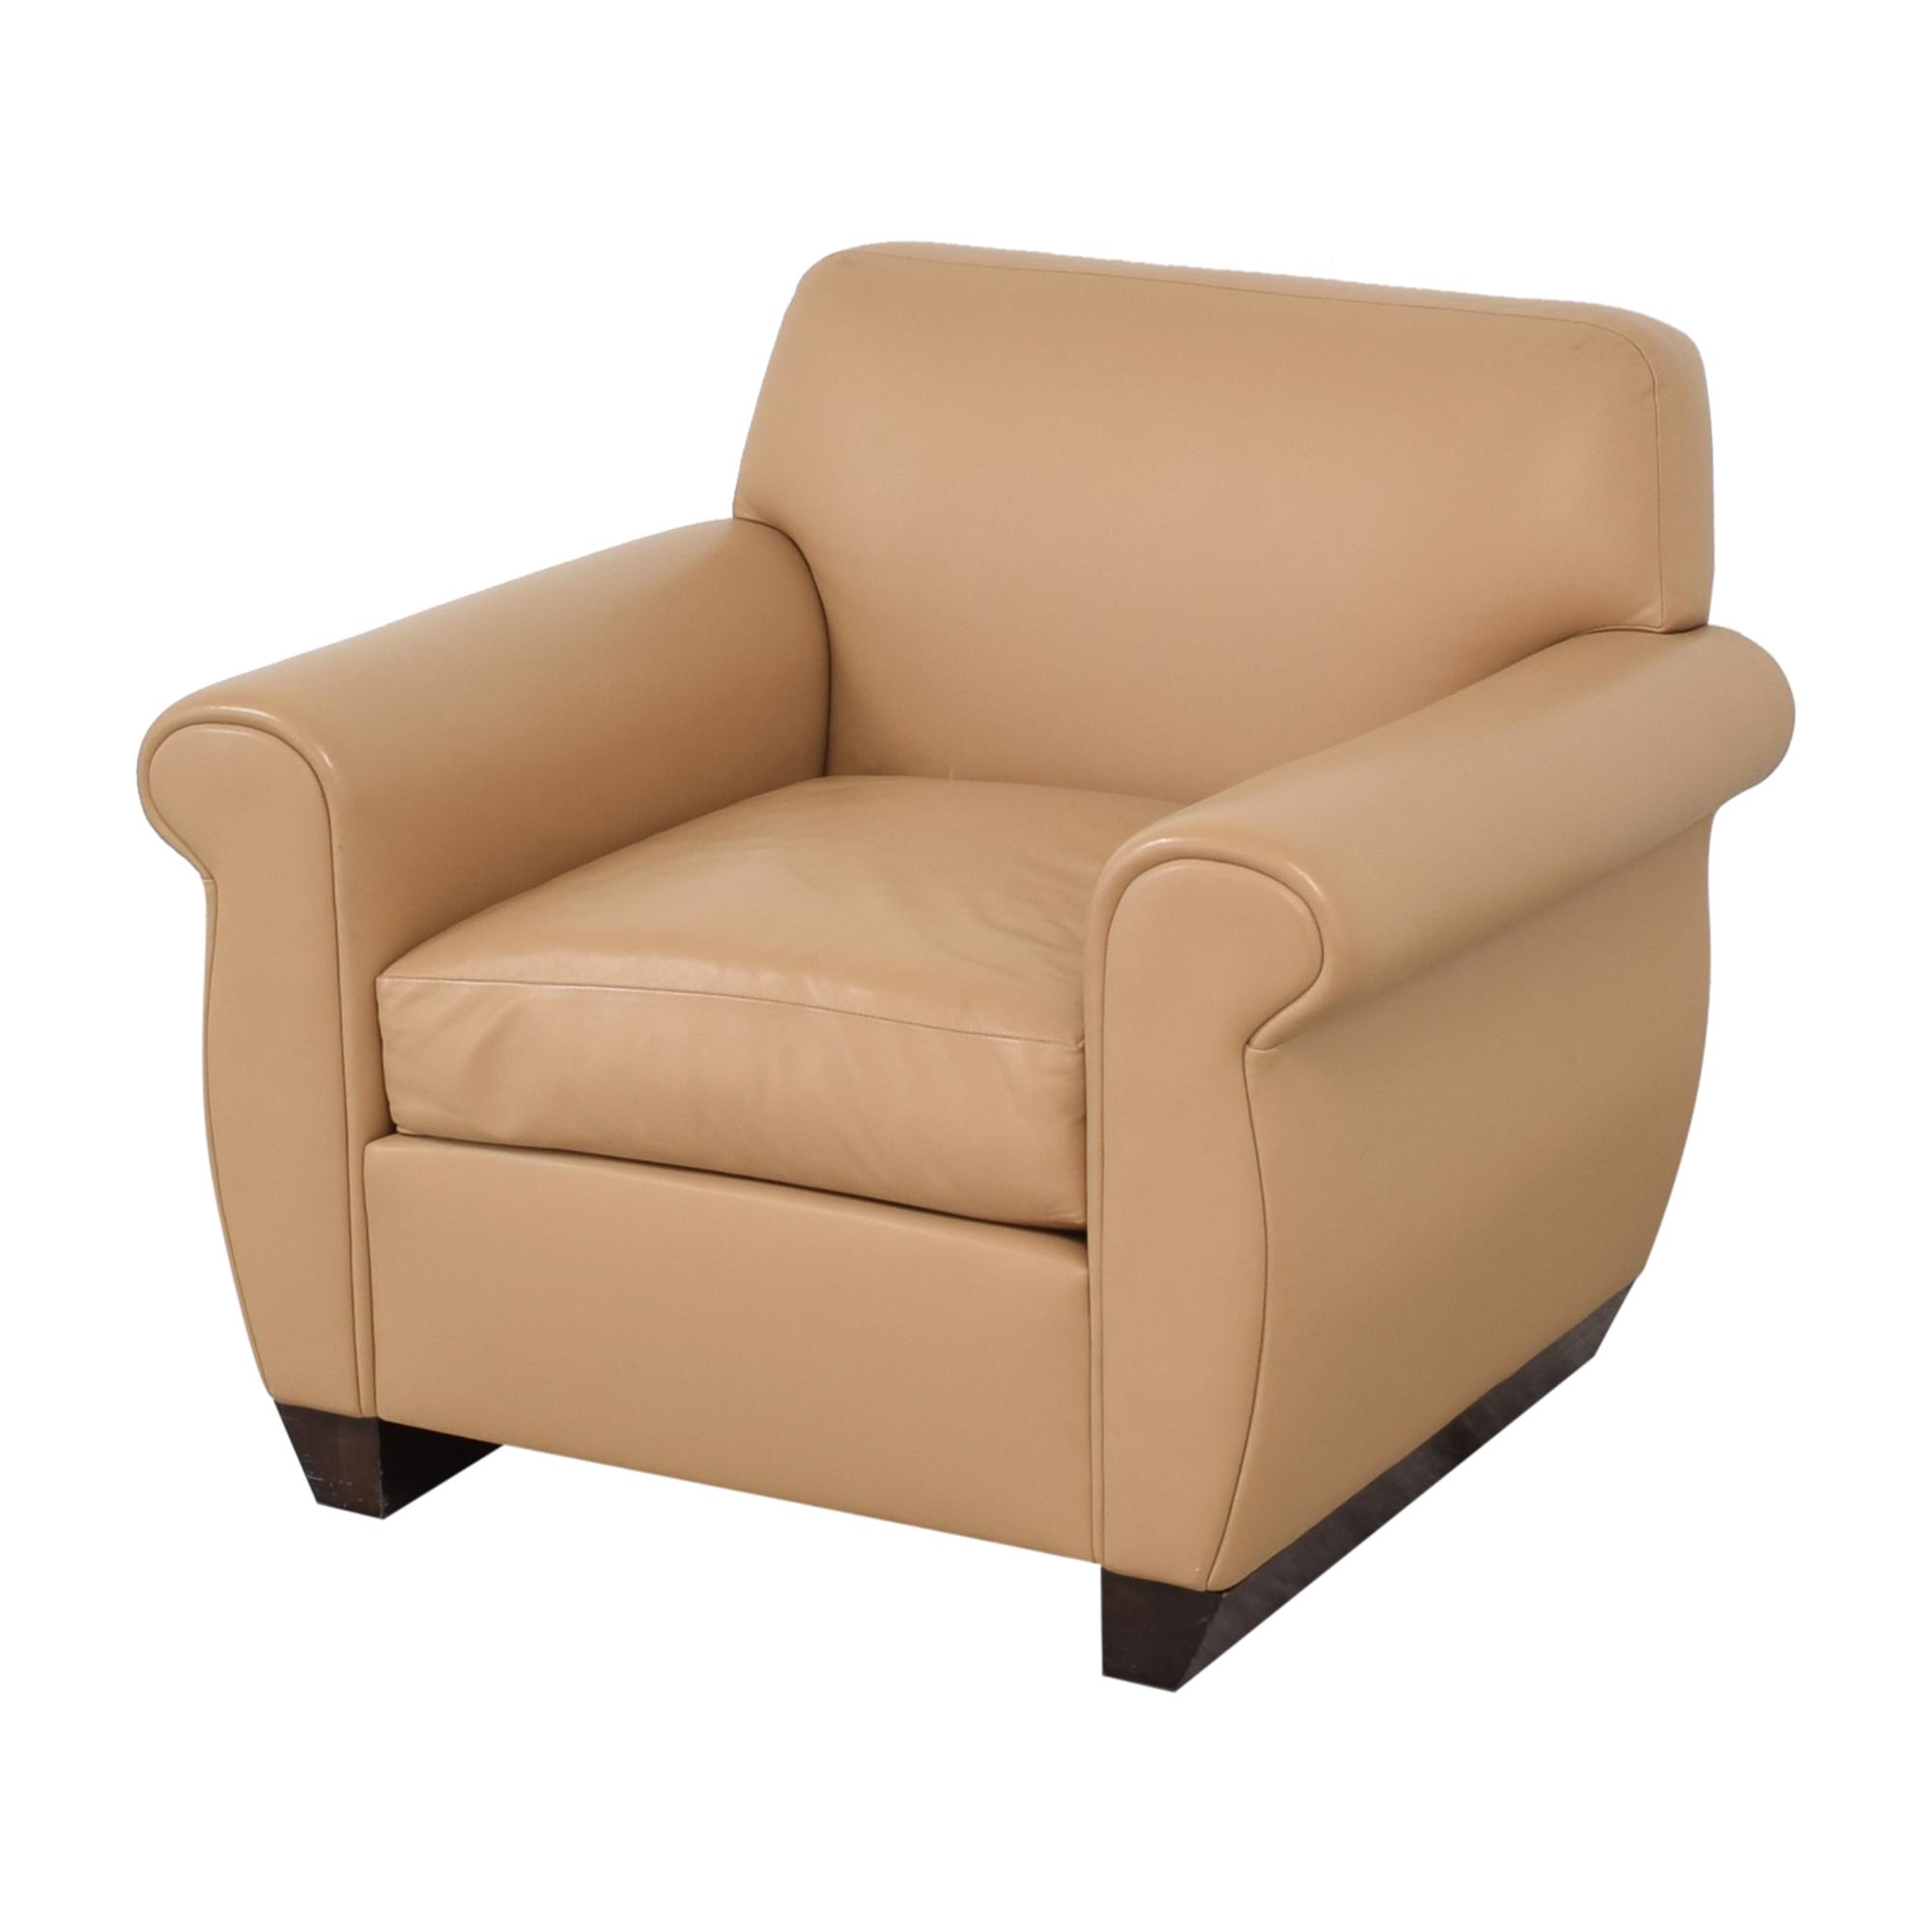 Bright Bright Chair Company Olli B Chair price